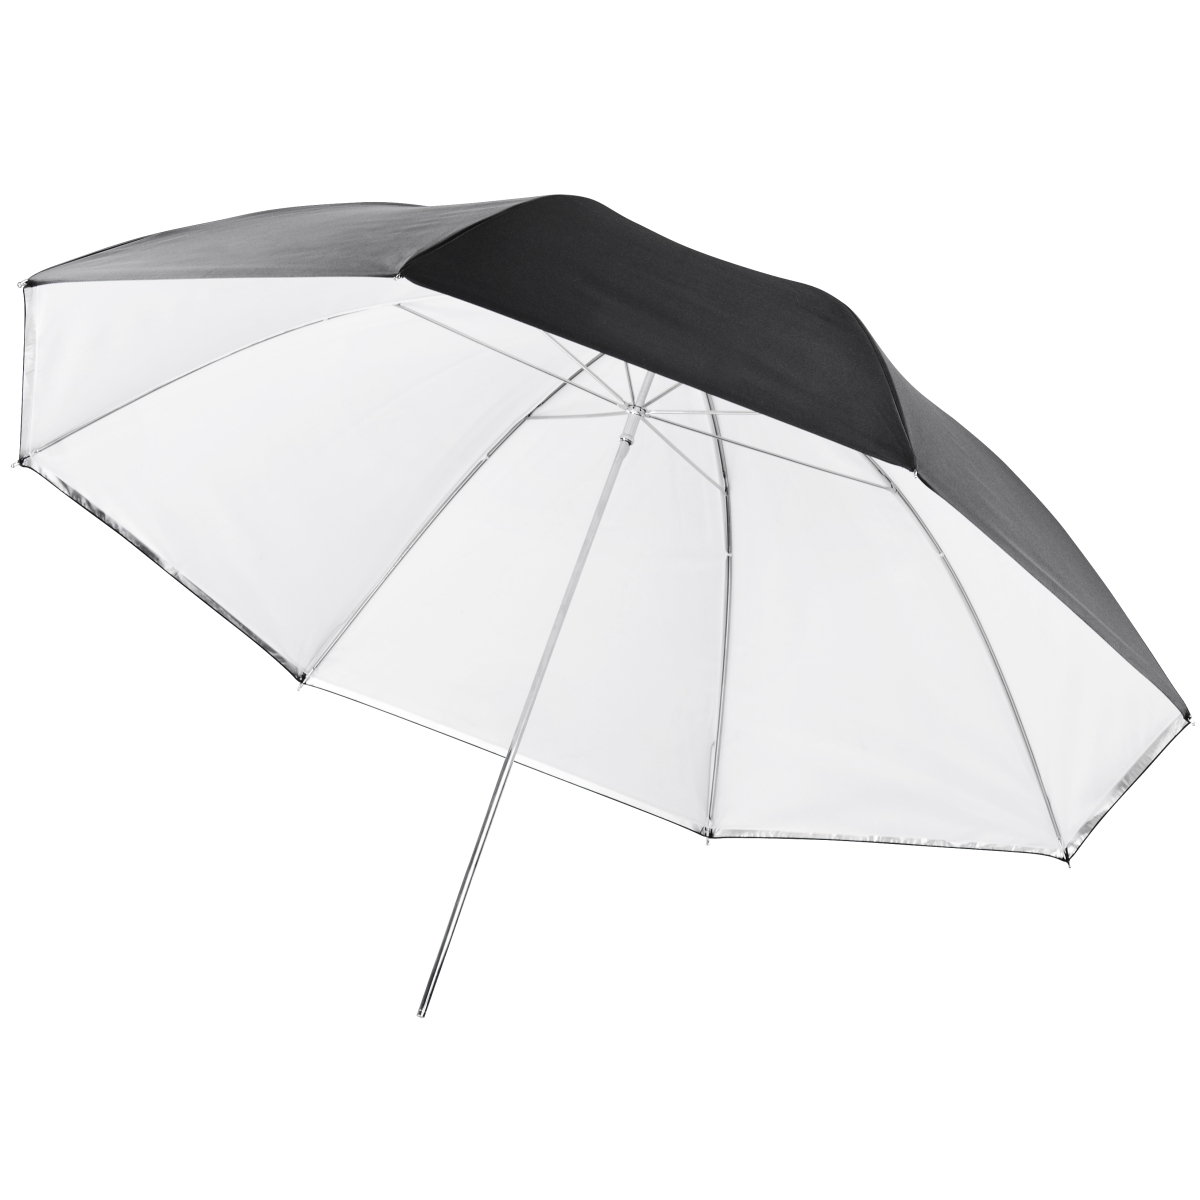 Walimex 2in1 Reflex & Transl. Umbrella white, 84cm